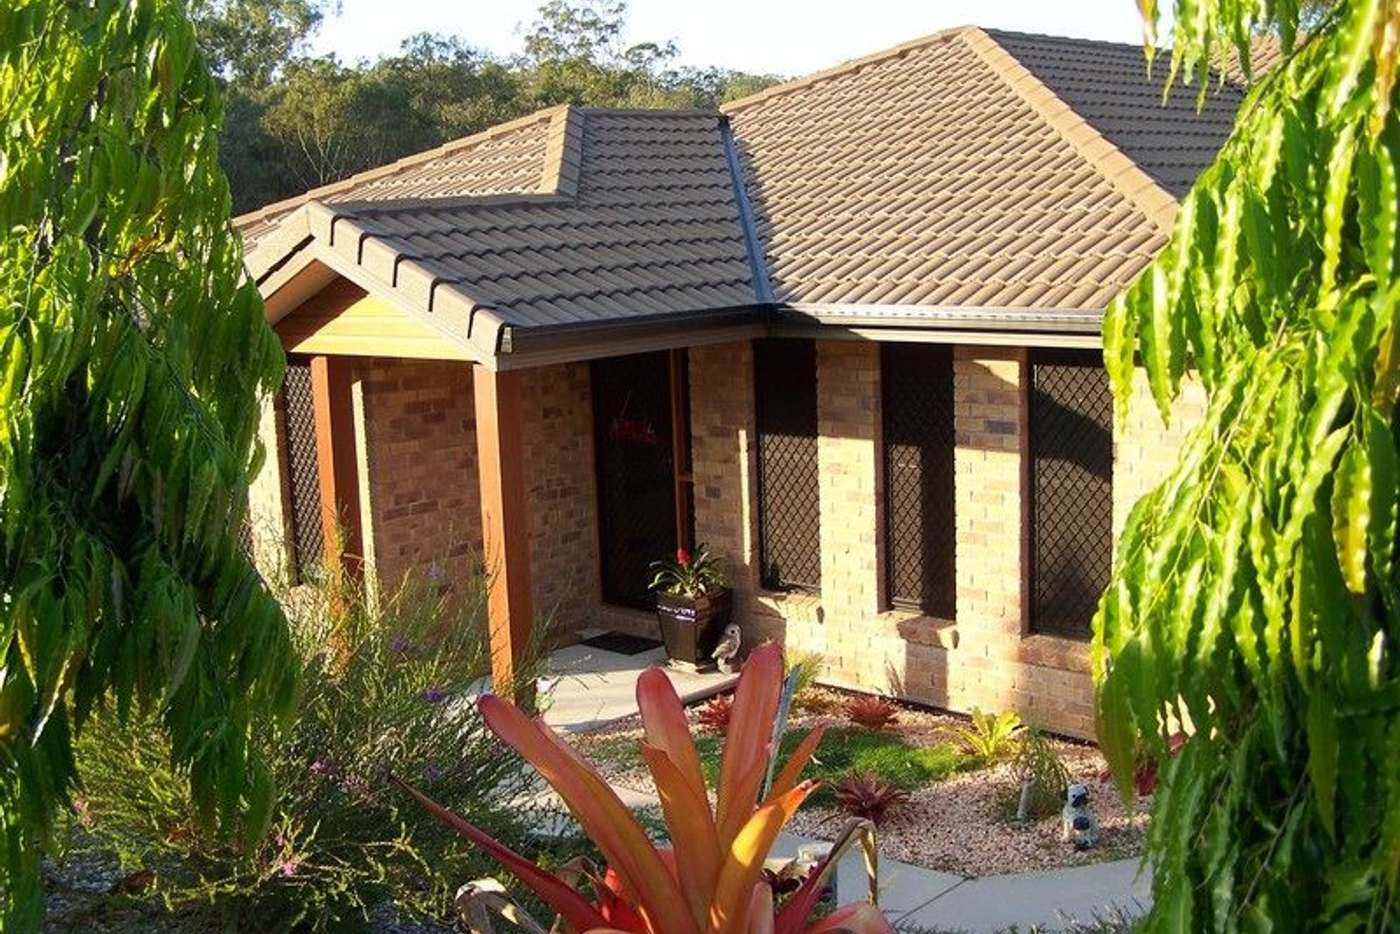 Main view of Homely house listing, 8 Bauhinia Street, Boyne Island QLD 4680